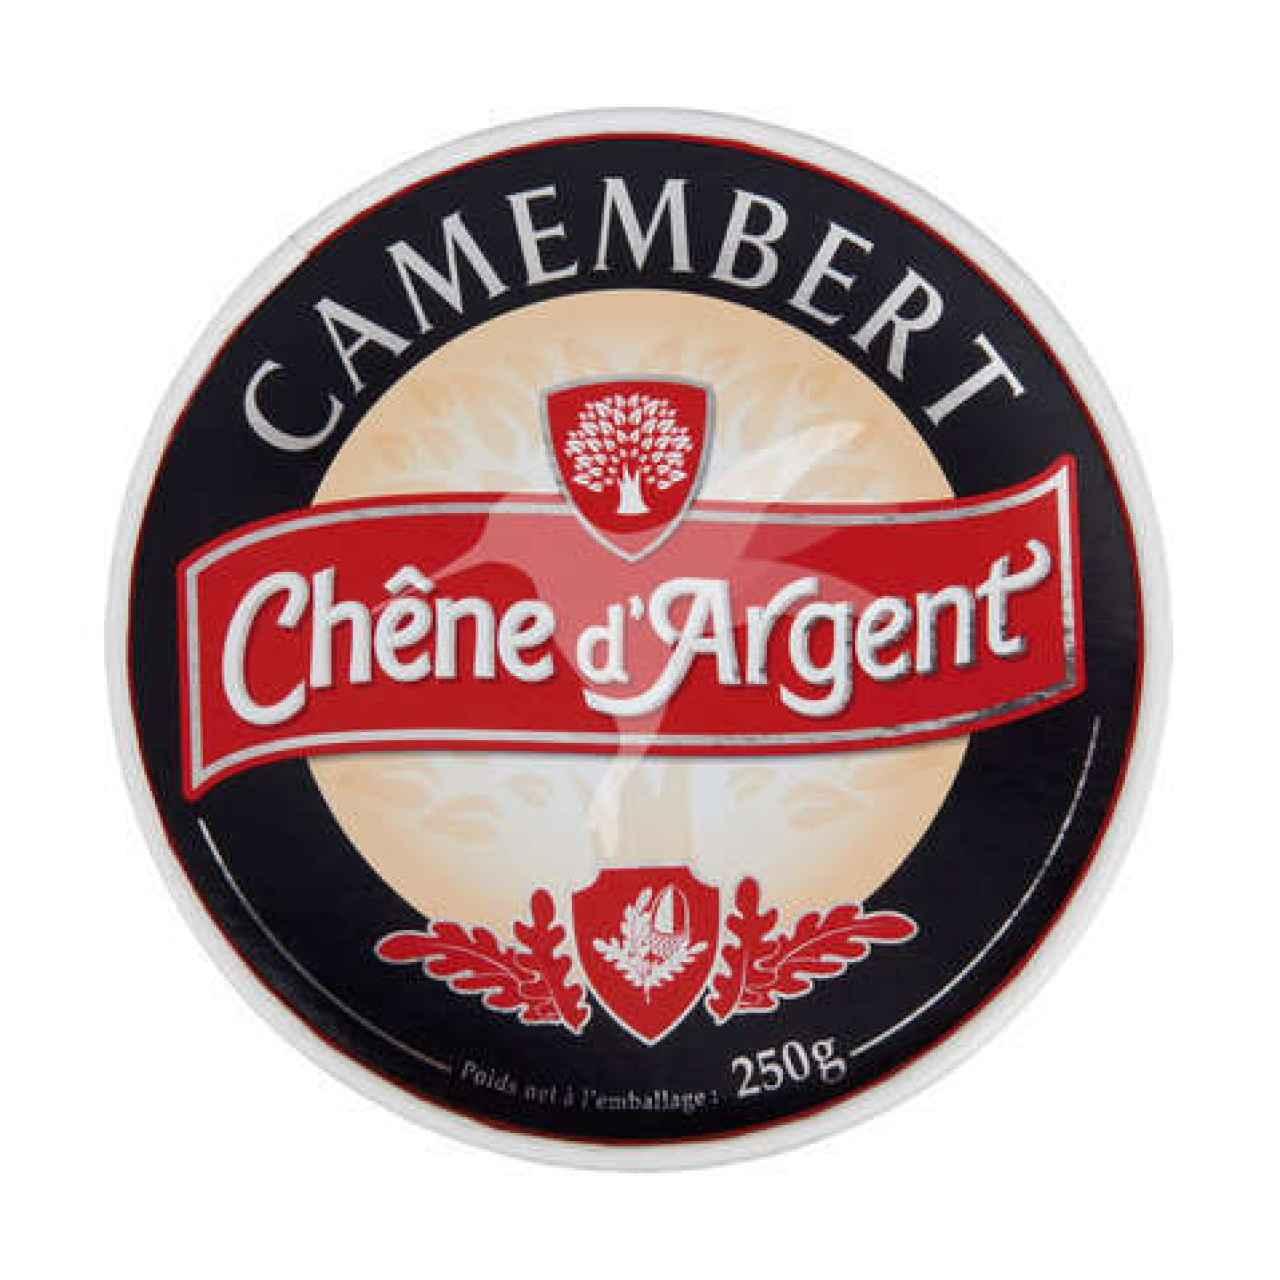 Camembert Chêne d`Argent. Foto: lolamarket